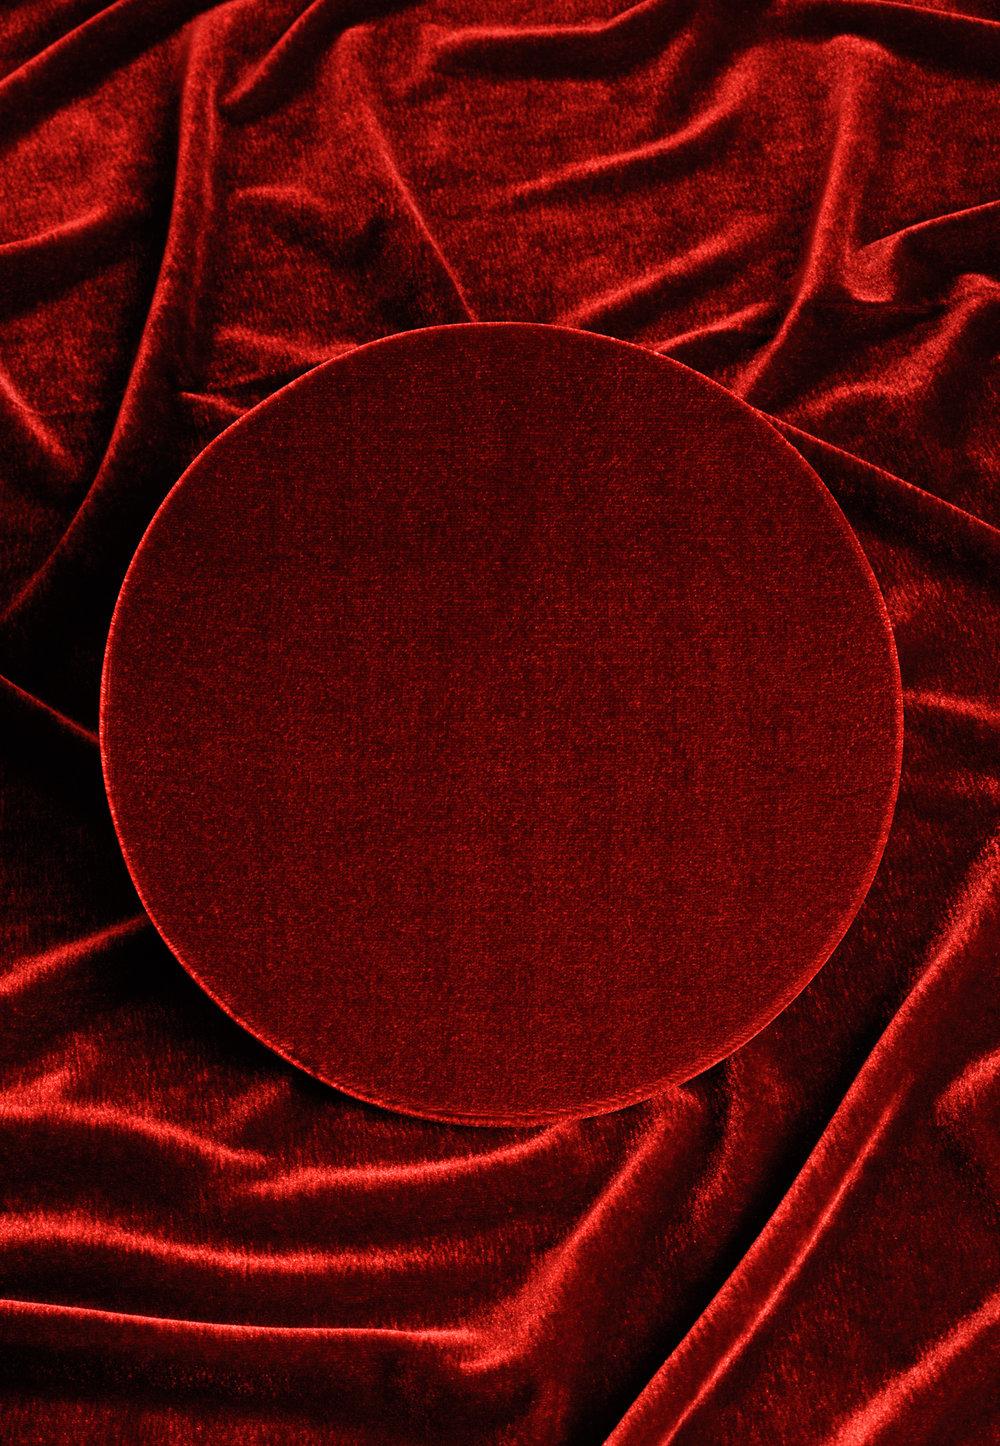 Red circle 4, 2016 C-Print, 52,5 x 36 cm